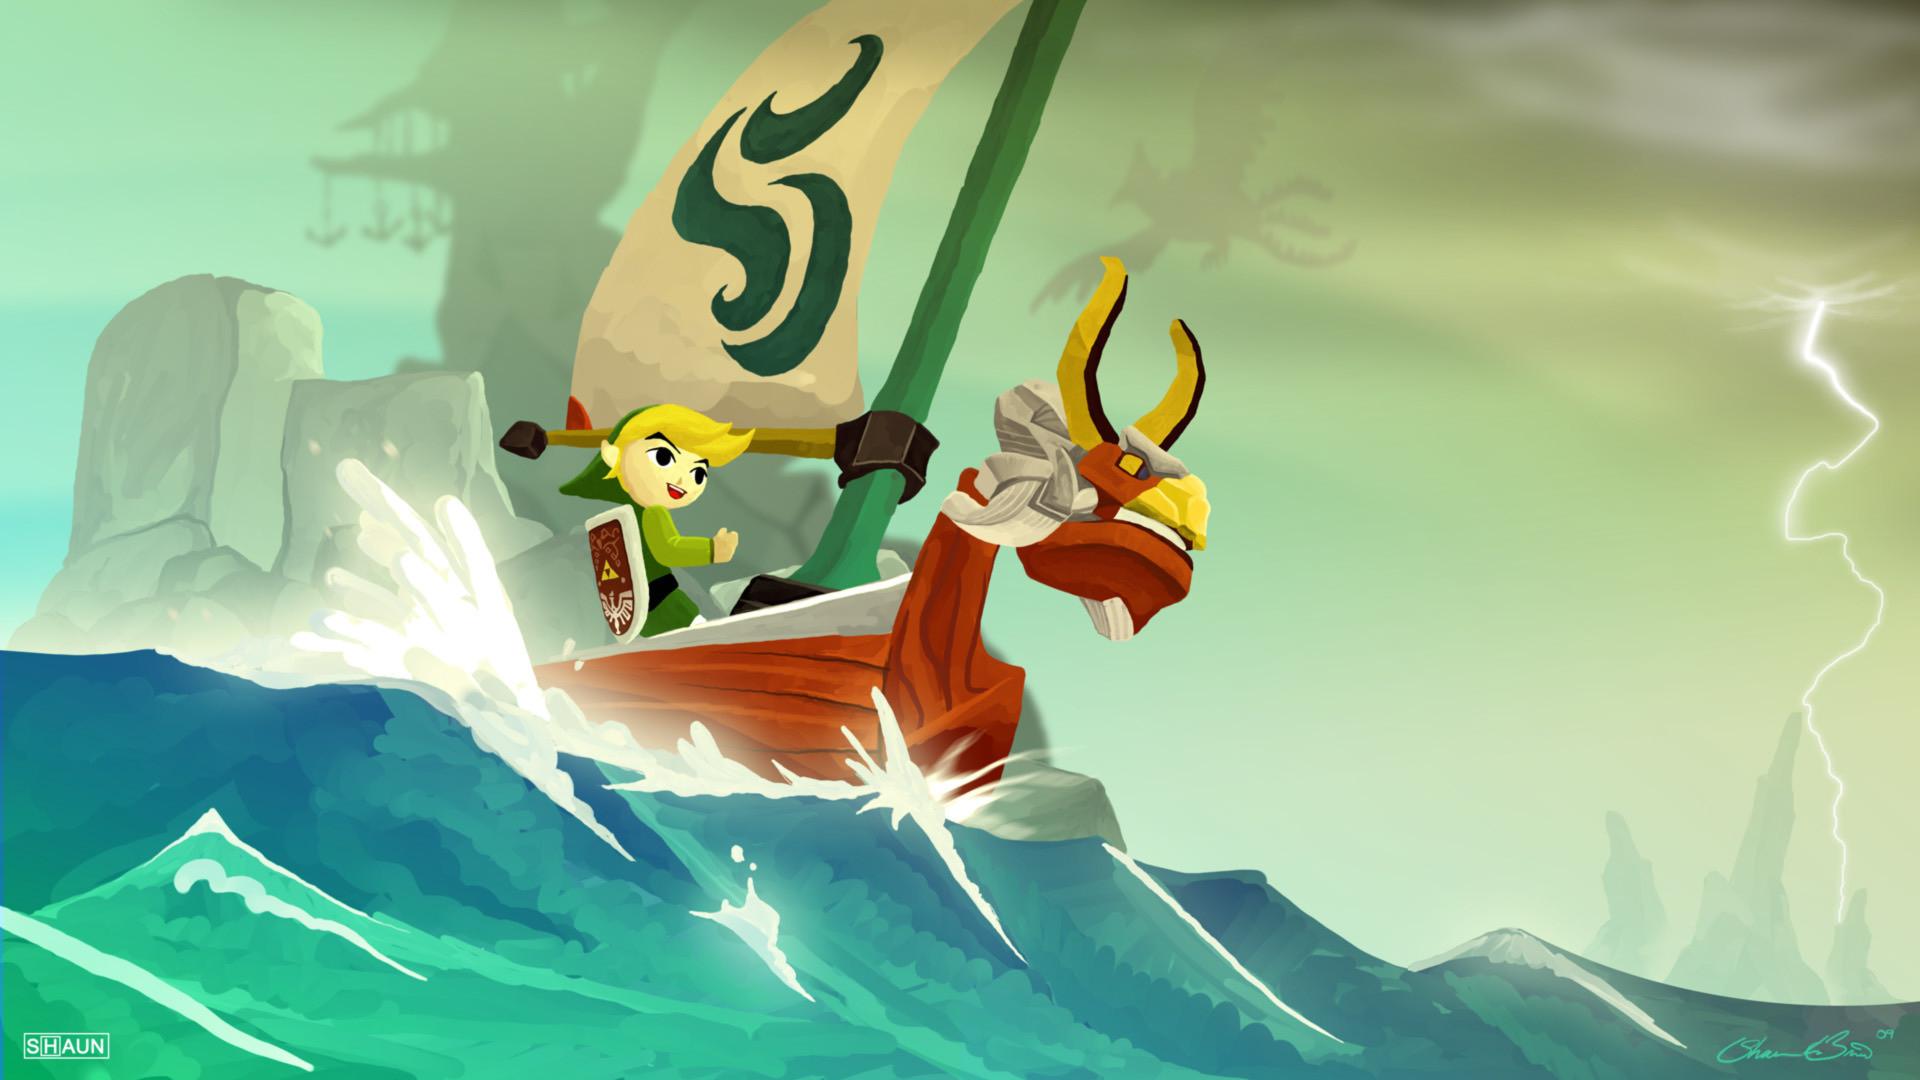 The Legend of Zelda: The Wind Waker Game HD desktop wallpaper, The Legend  of Zelda wallpaper, Zelda wallpaper, Link wallpaper – Games no.